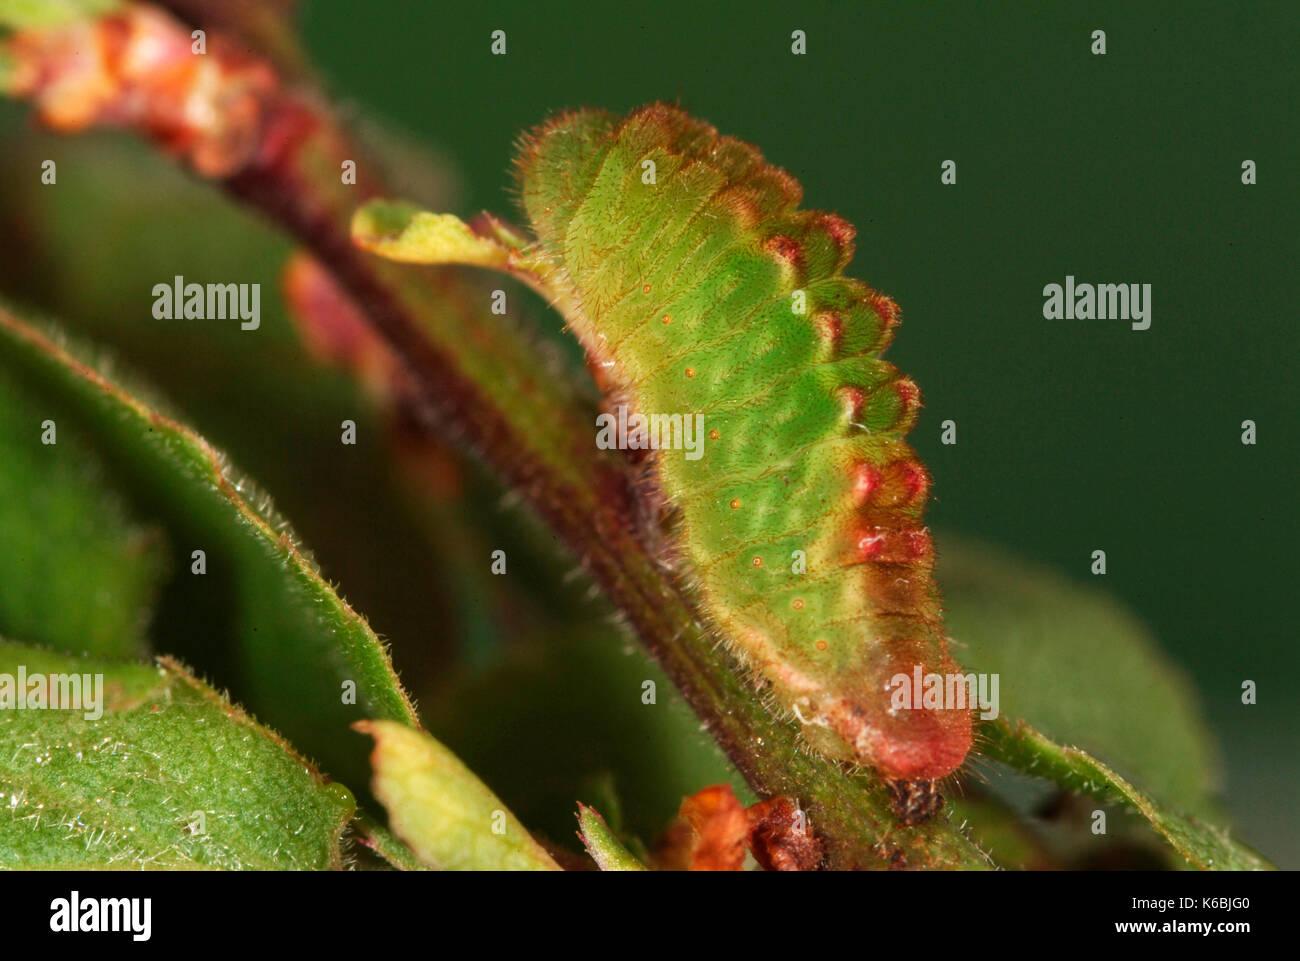 a4e38ea4 Black Hairstreak Butterfly, Caterpillar, Strymonidia pruni, Larvae, on stem  of sloe, foodplant, green with red ridge